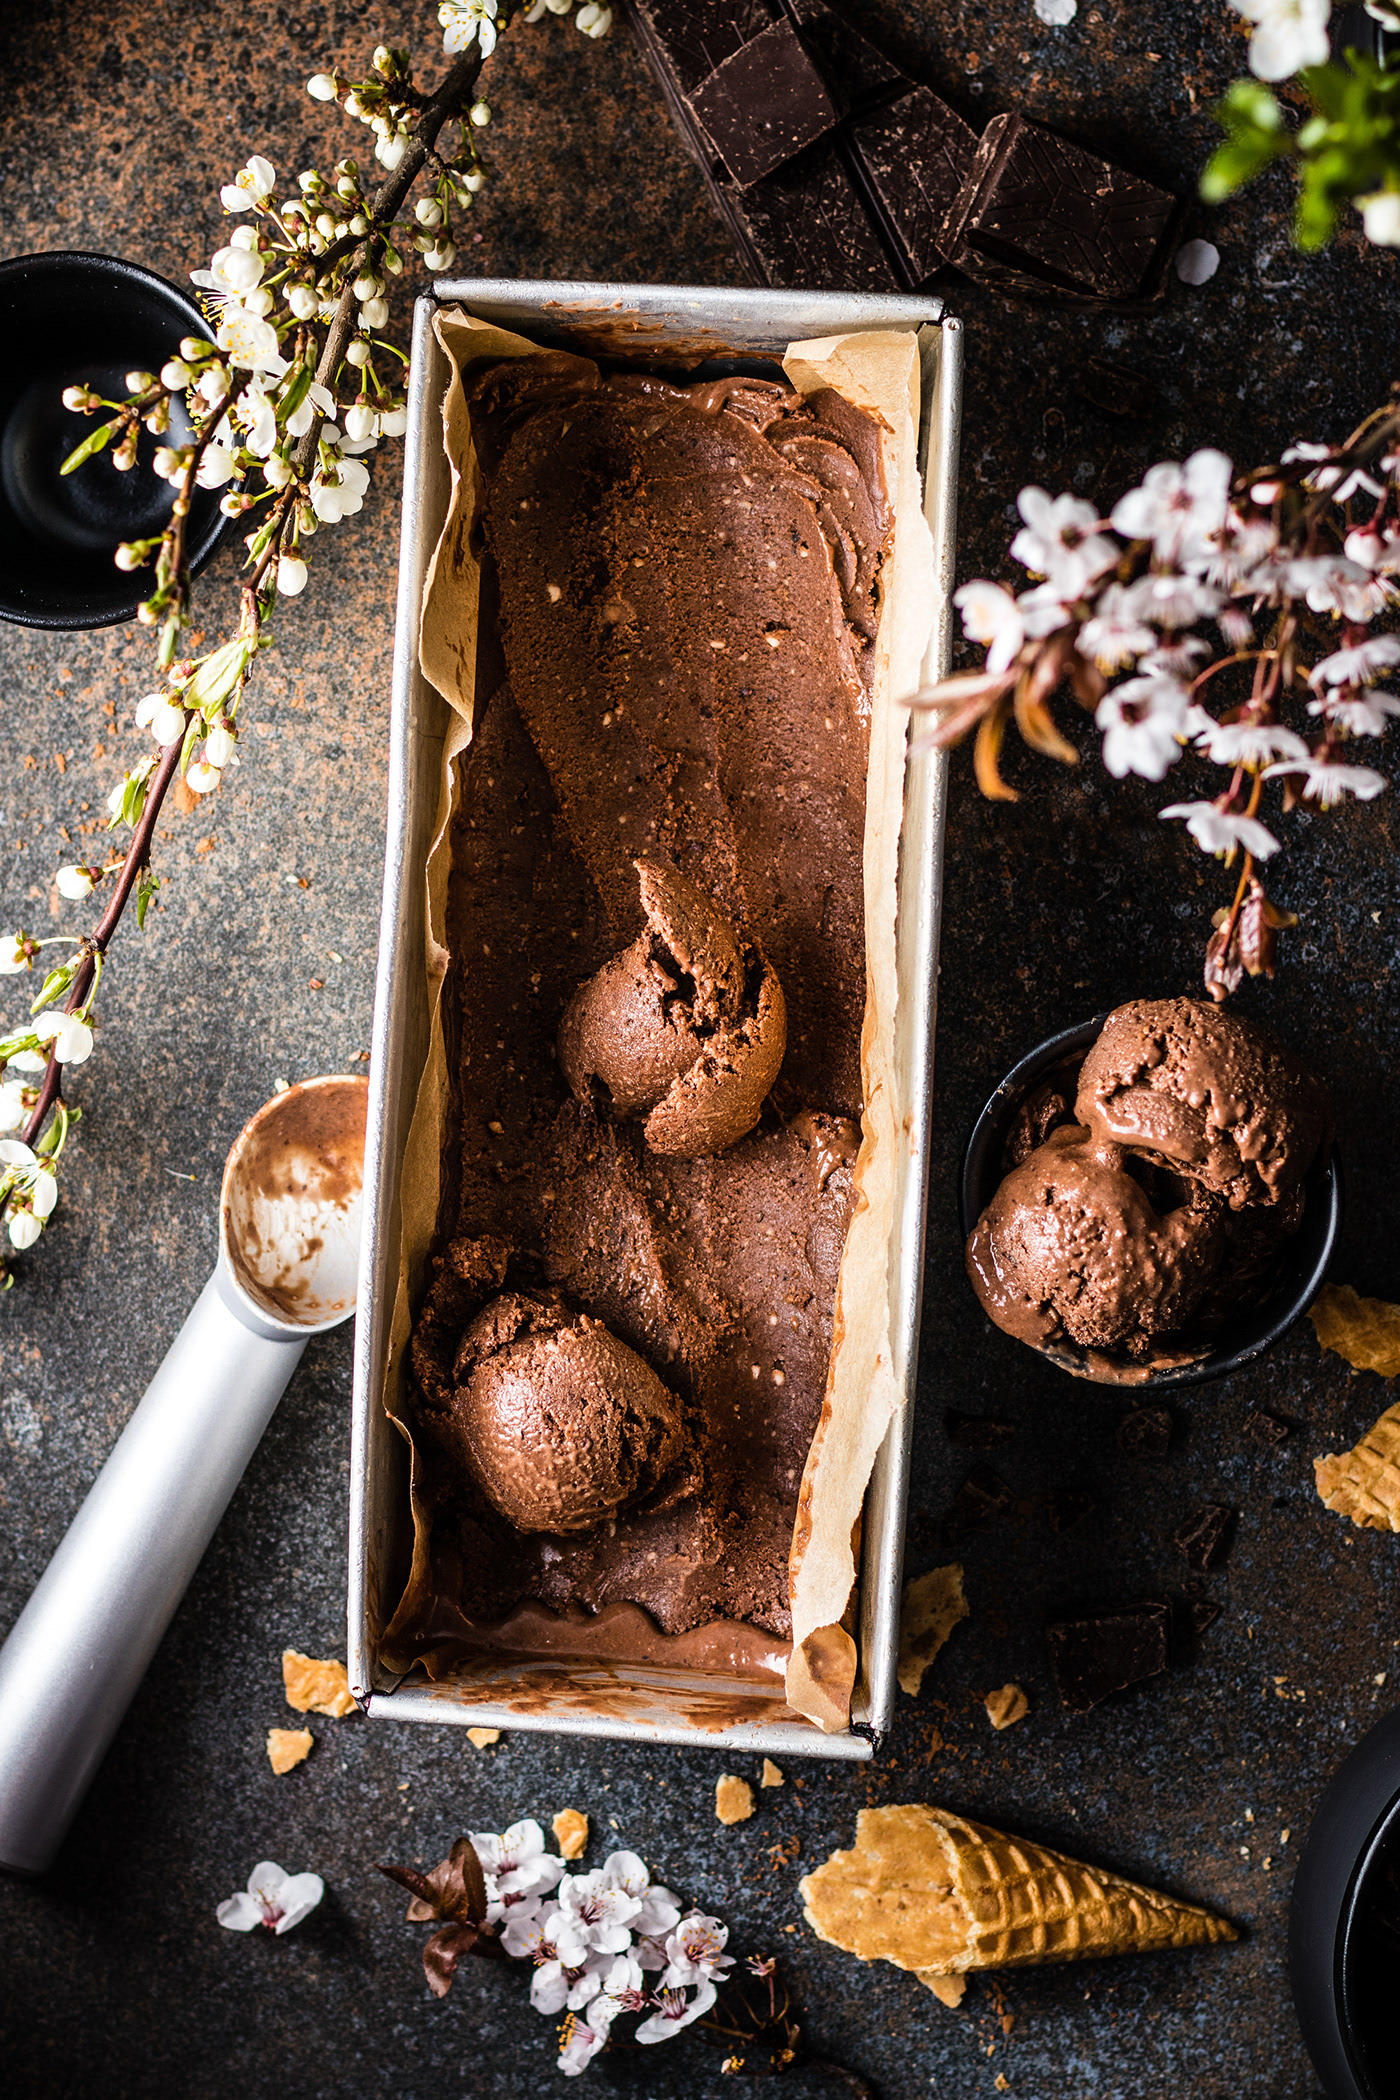 Chocalate and hazelnut ice cream / фотограф Amalija Andersone